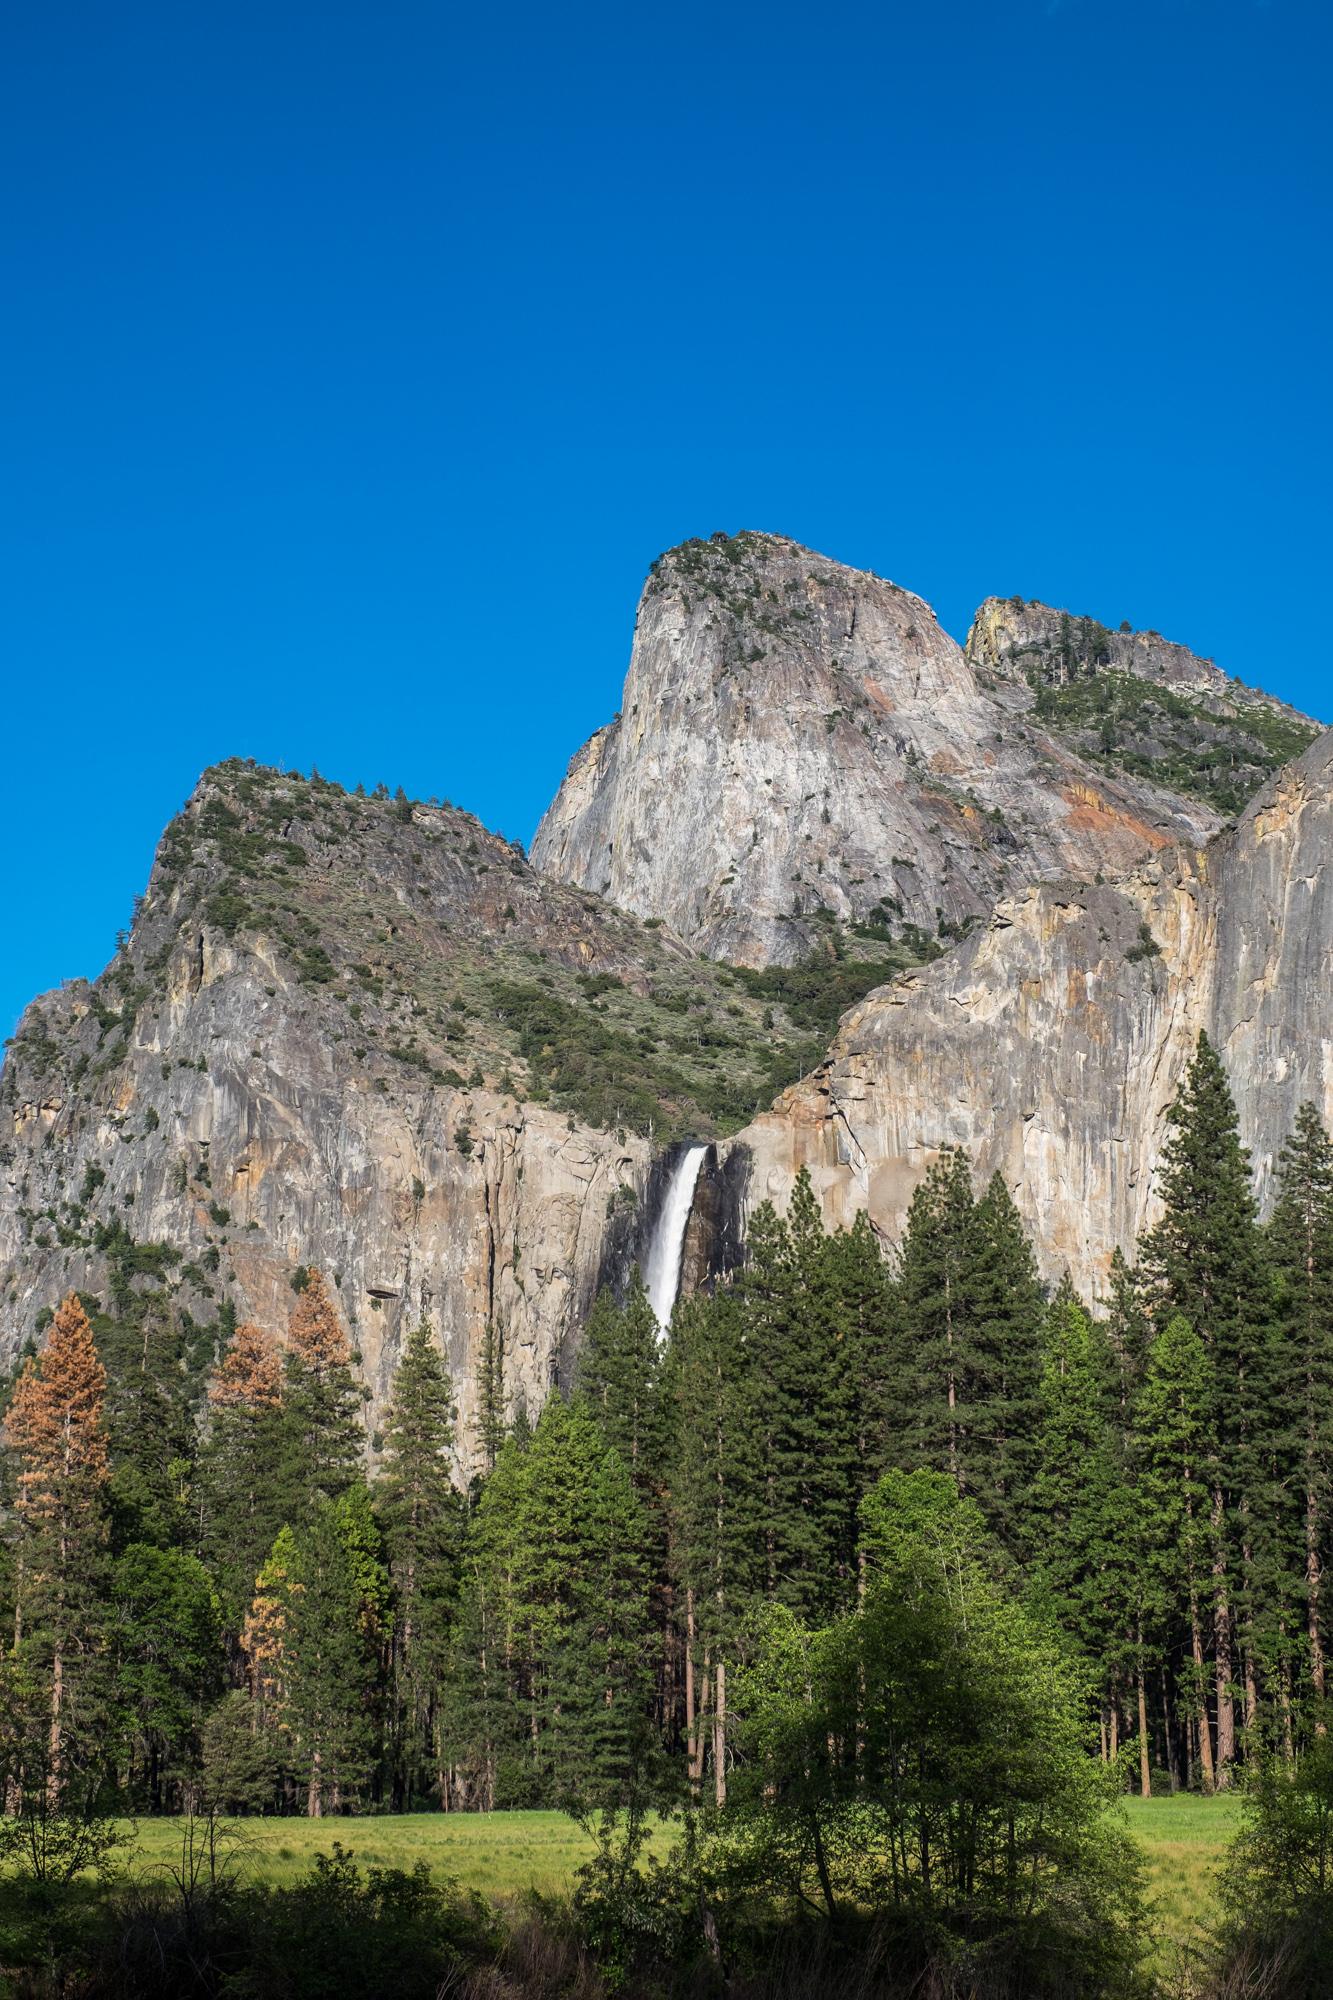 Yosemite National Park - 004.jpg